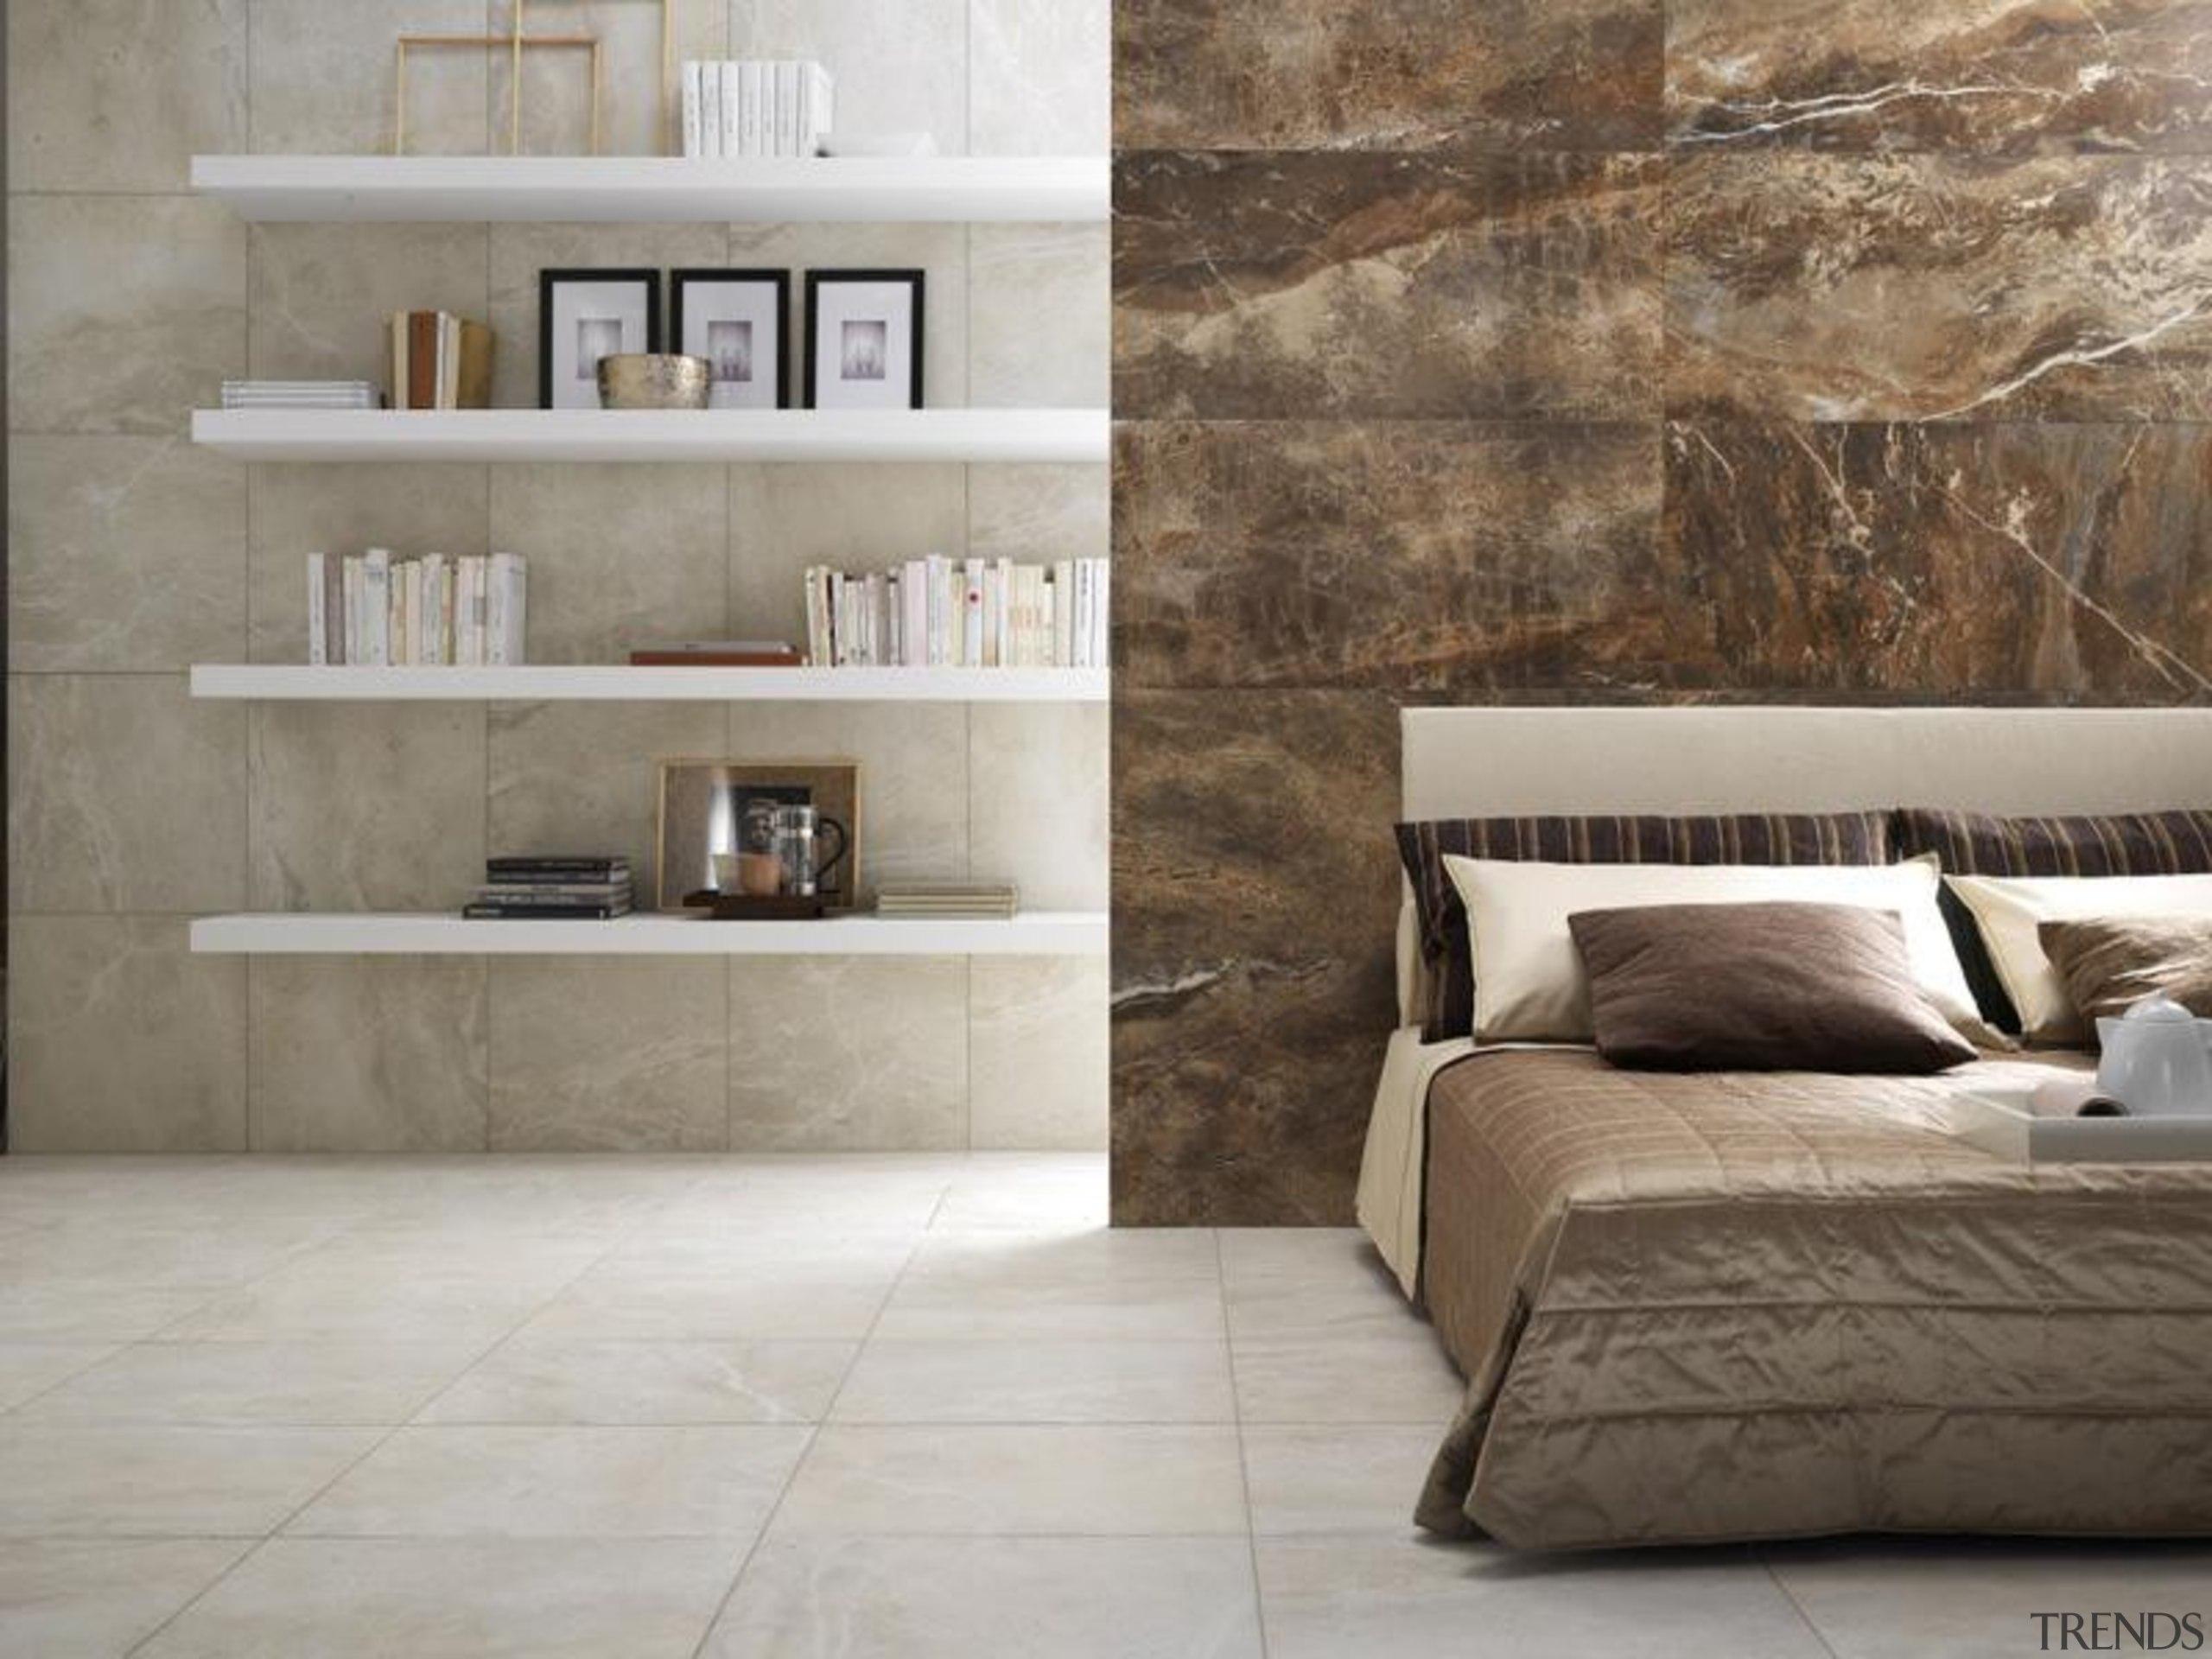 Thrill bone interior bedroom floor and wall tiles floor, flooring, furniture, interior design, laminate flooring, living room, shelf, tile, wall, wood, wood flooring, gray